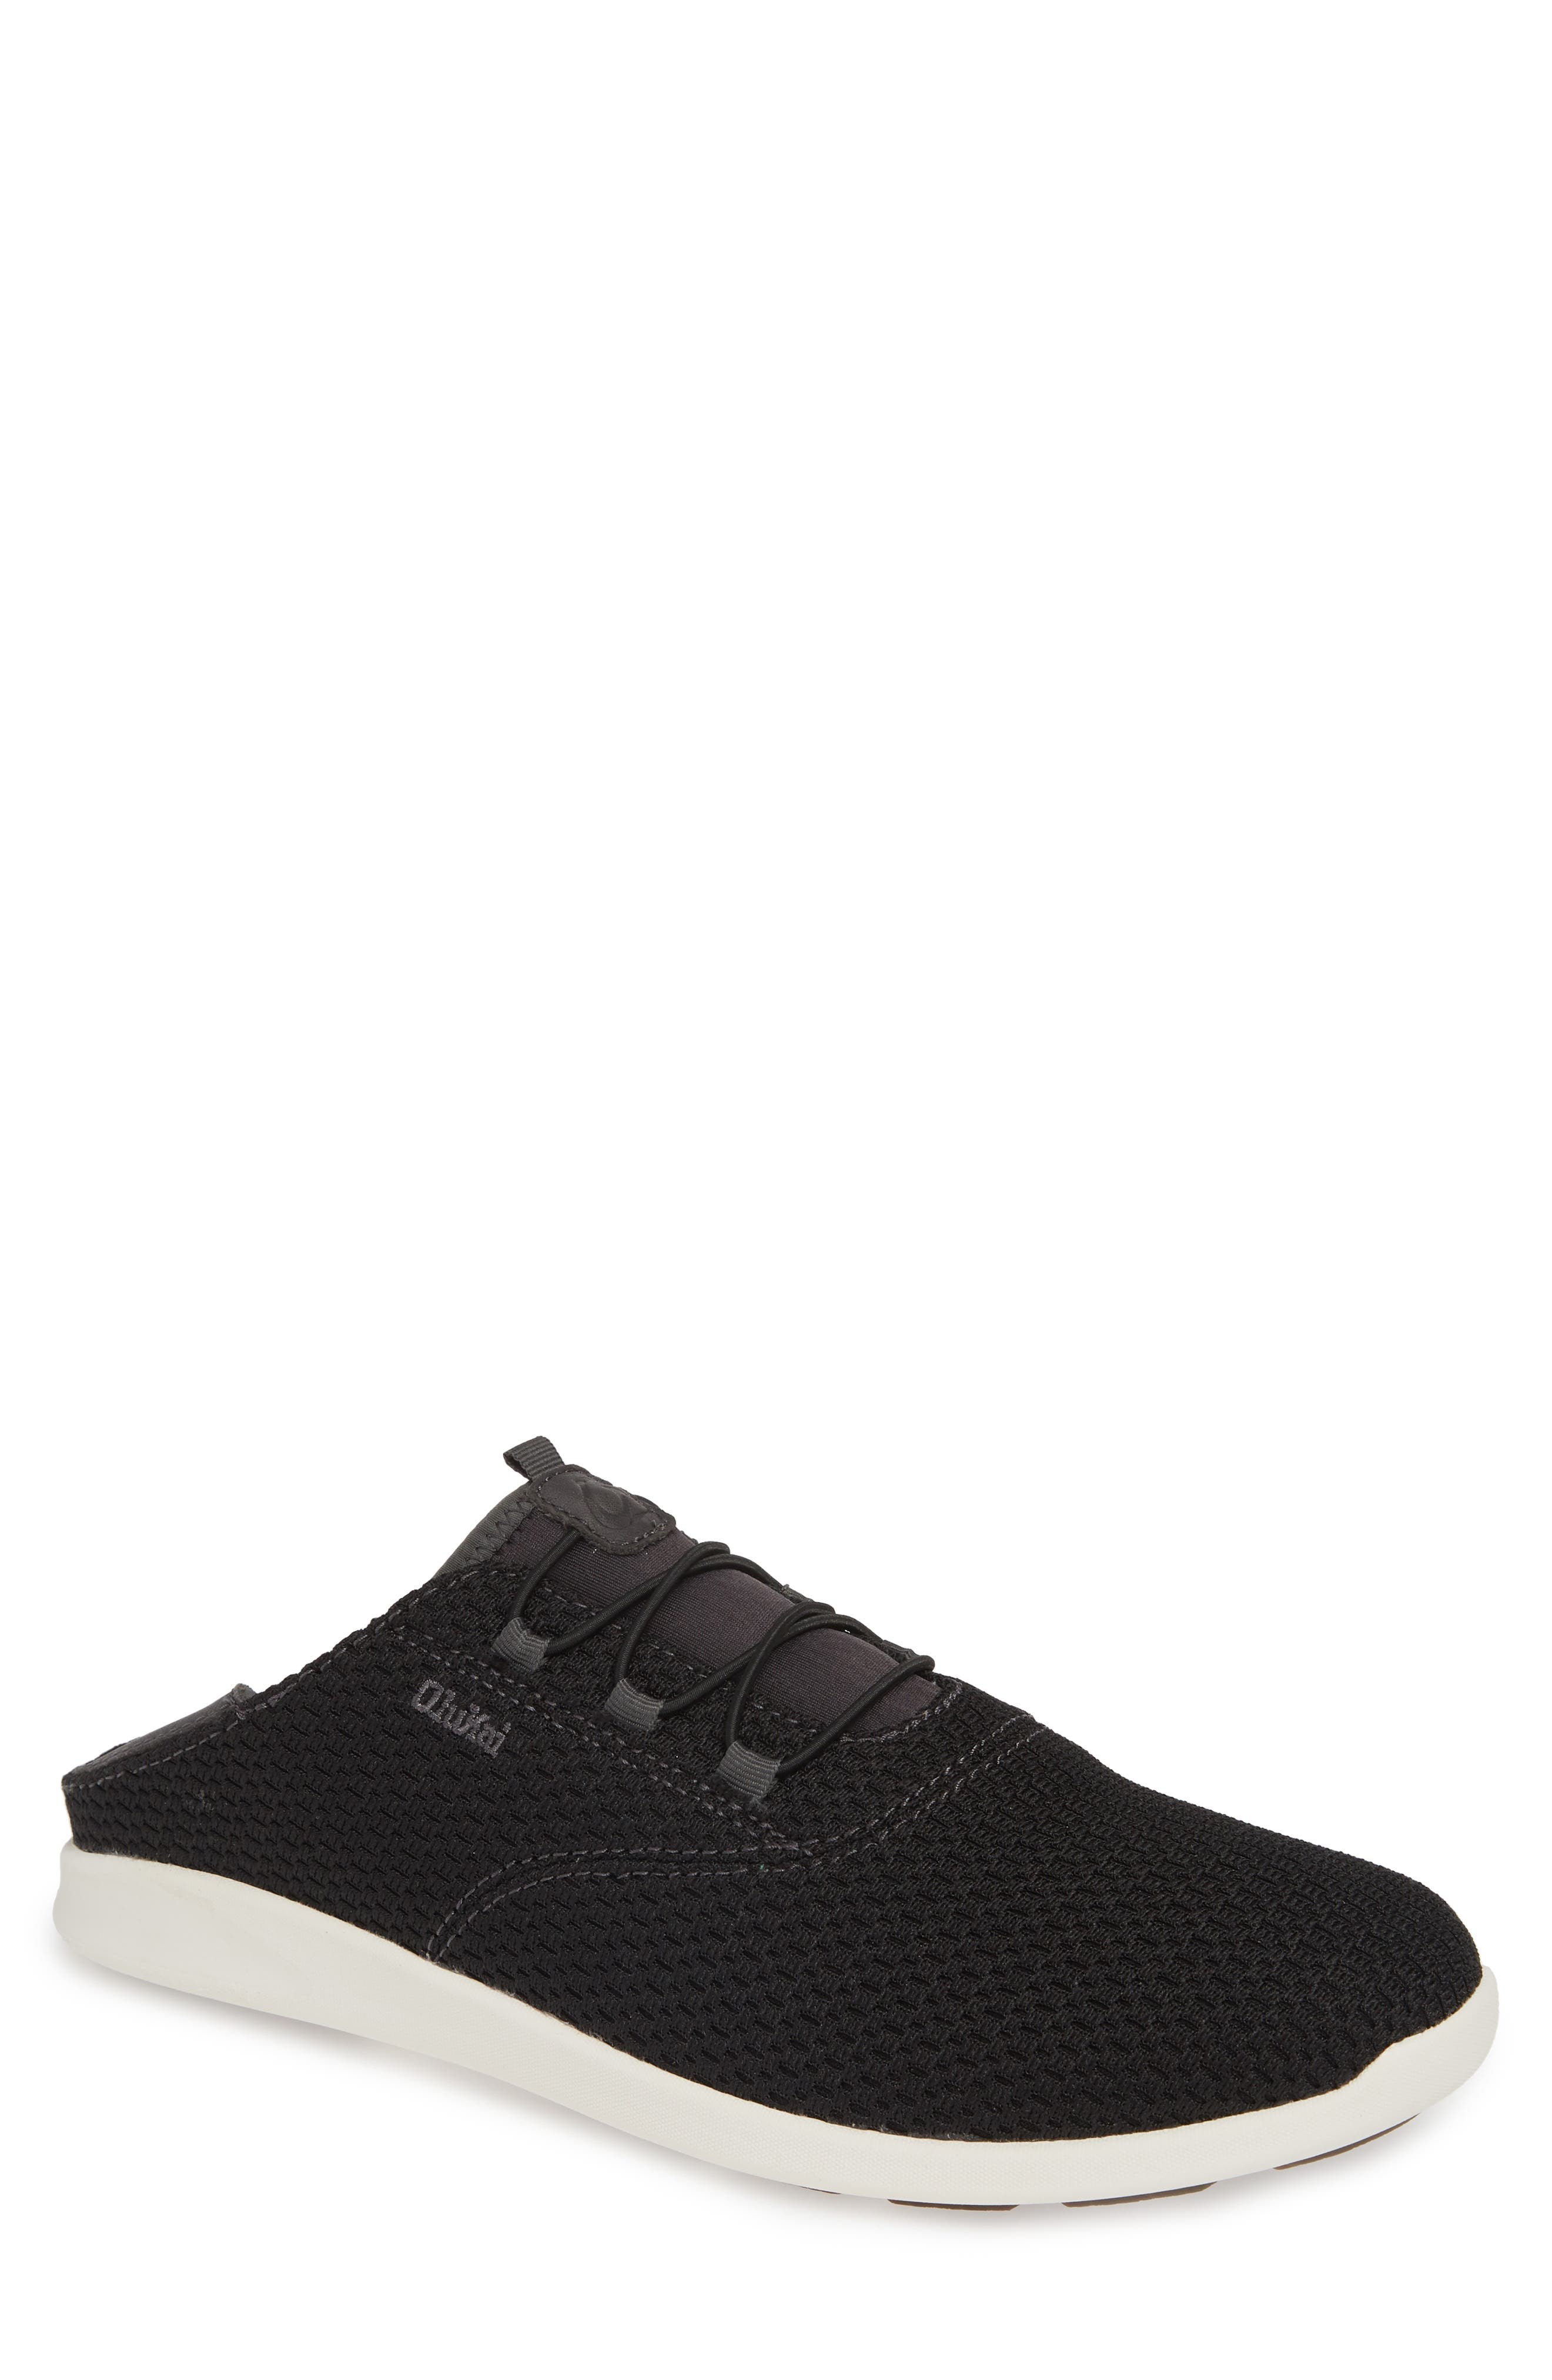 OLUKAI, Alapa Li Sneaker, Main thumbnail 1, color, BLACK/ DARK SHADOW MESH